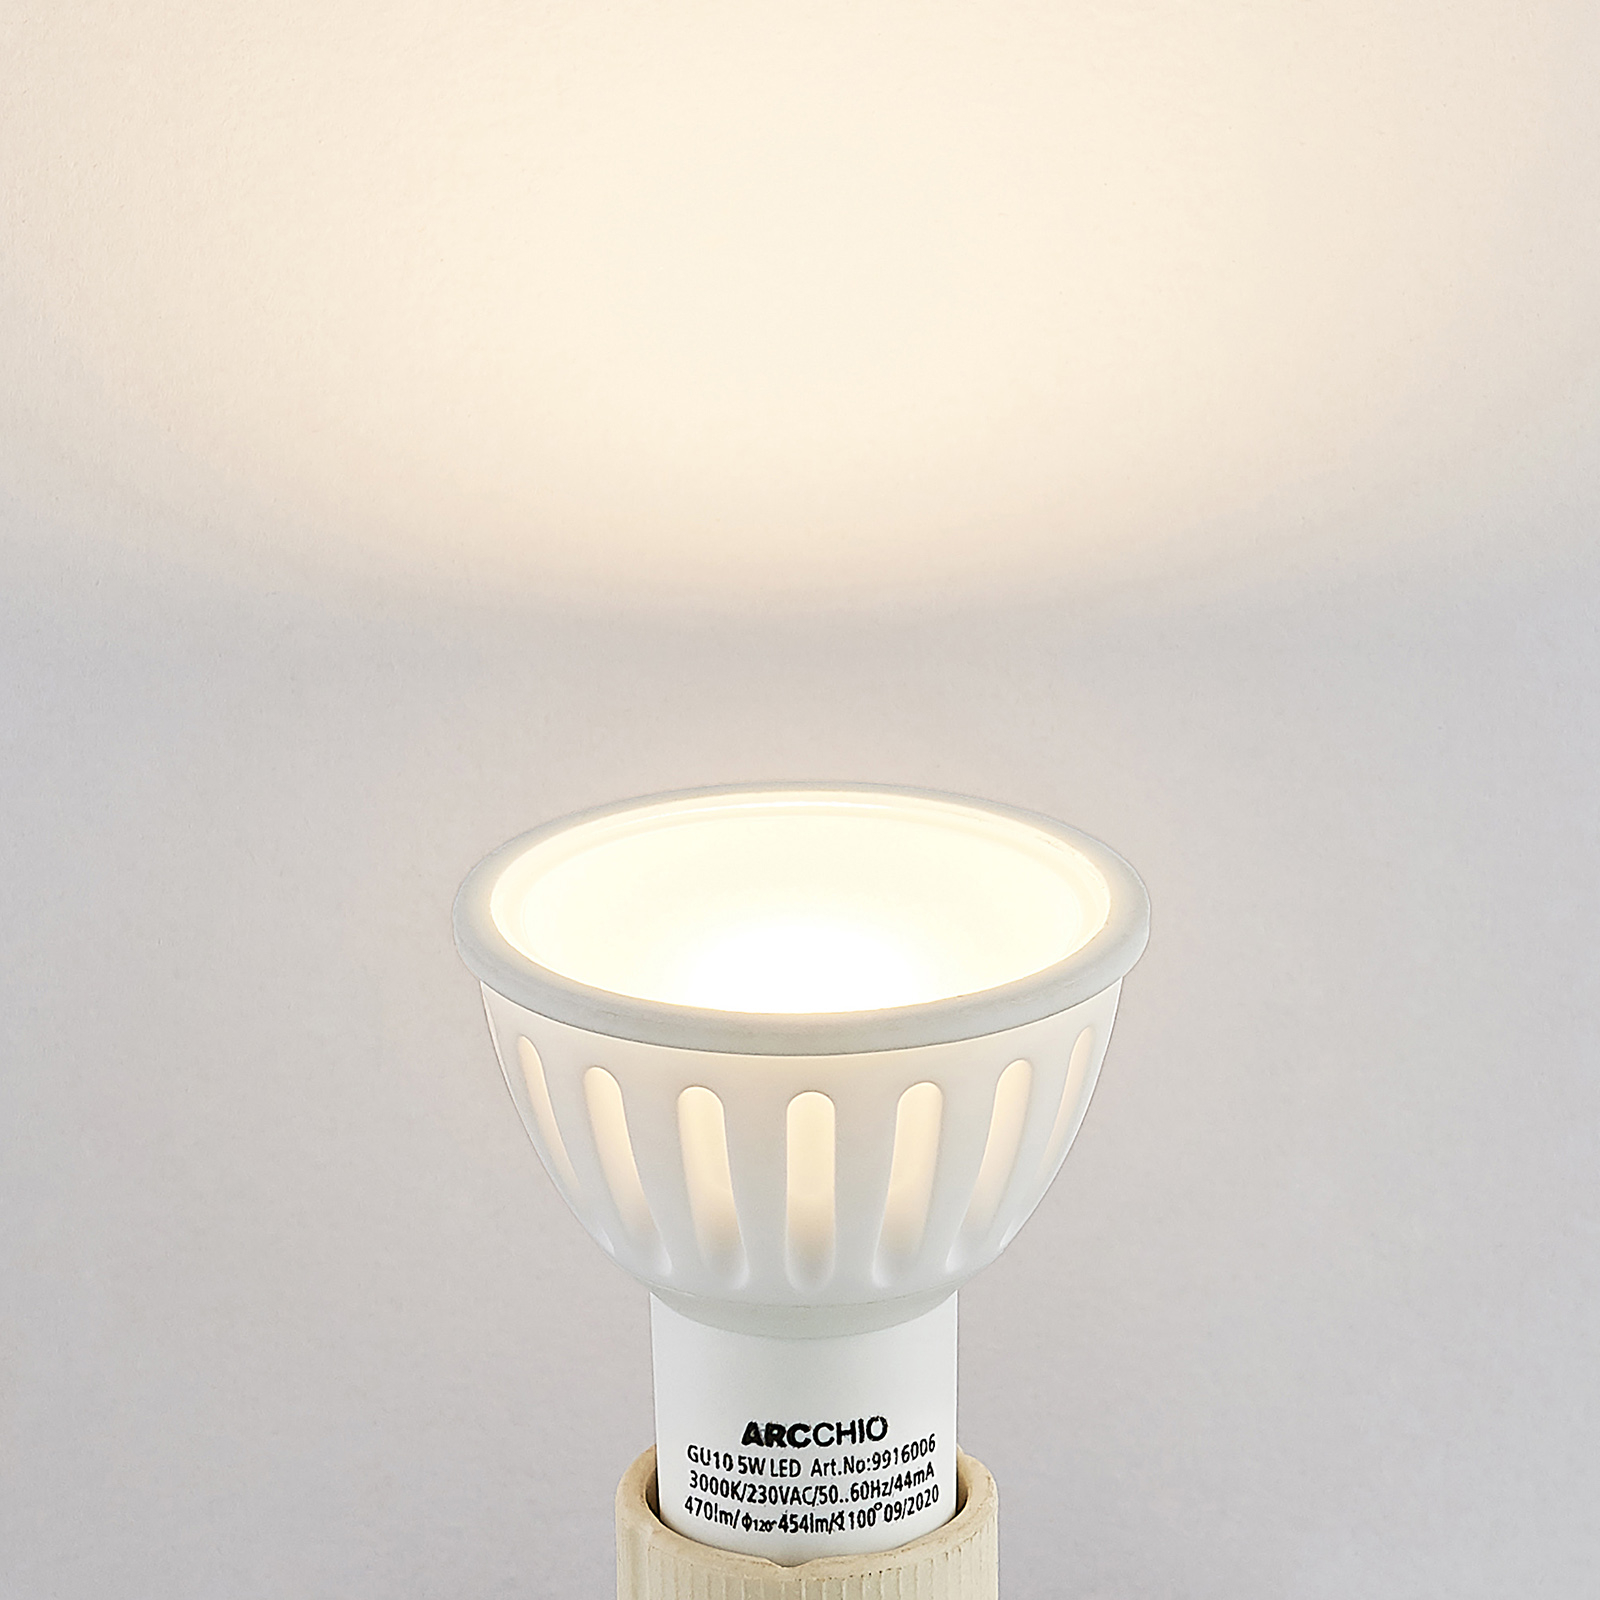 Arcchio-LED-heljastinlamppu GU10 100° 5W 3 000 K